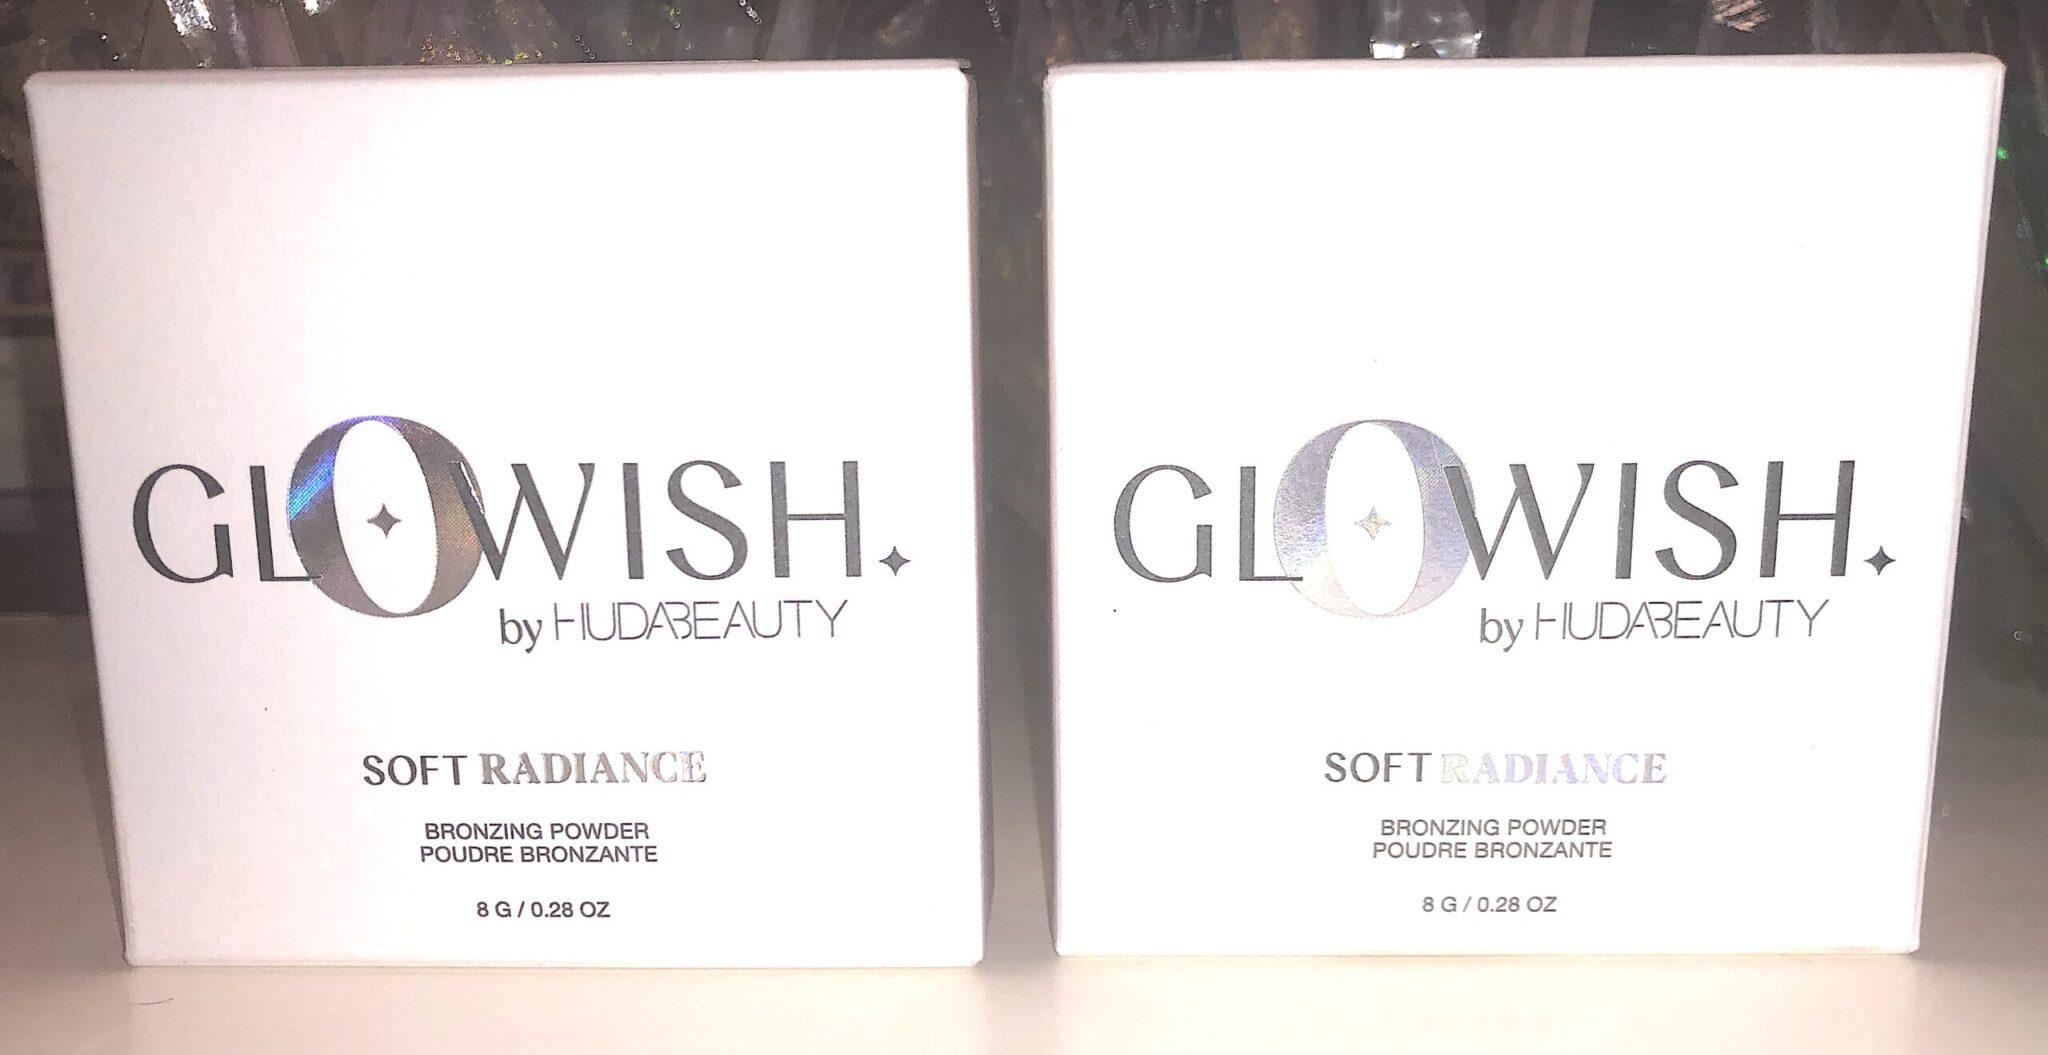 Huda Glowish Soft Radiance Bronzing Powder boxes